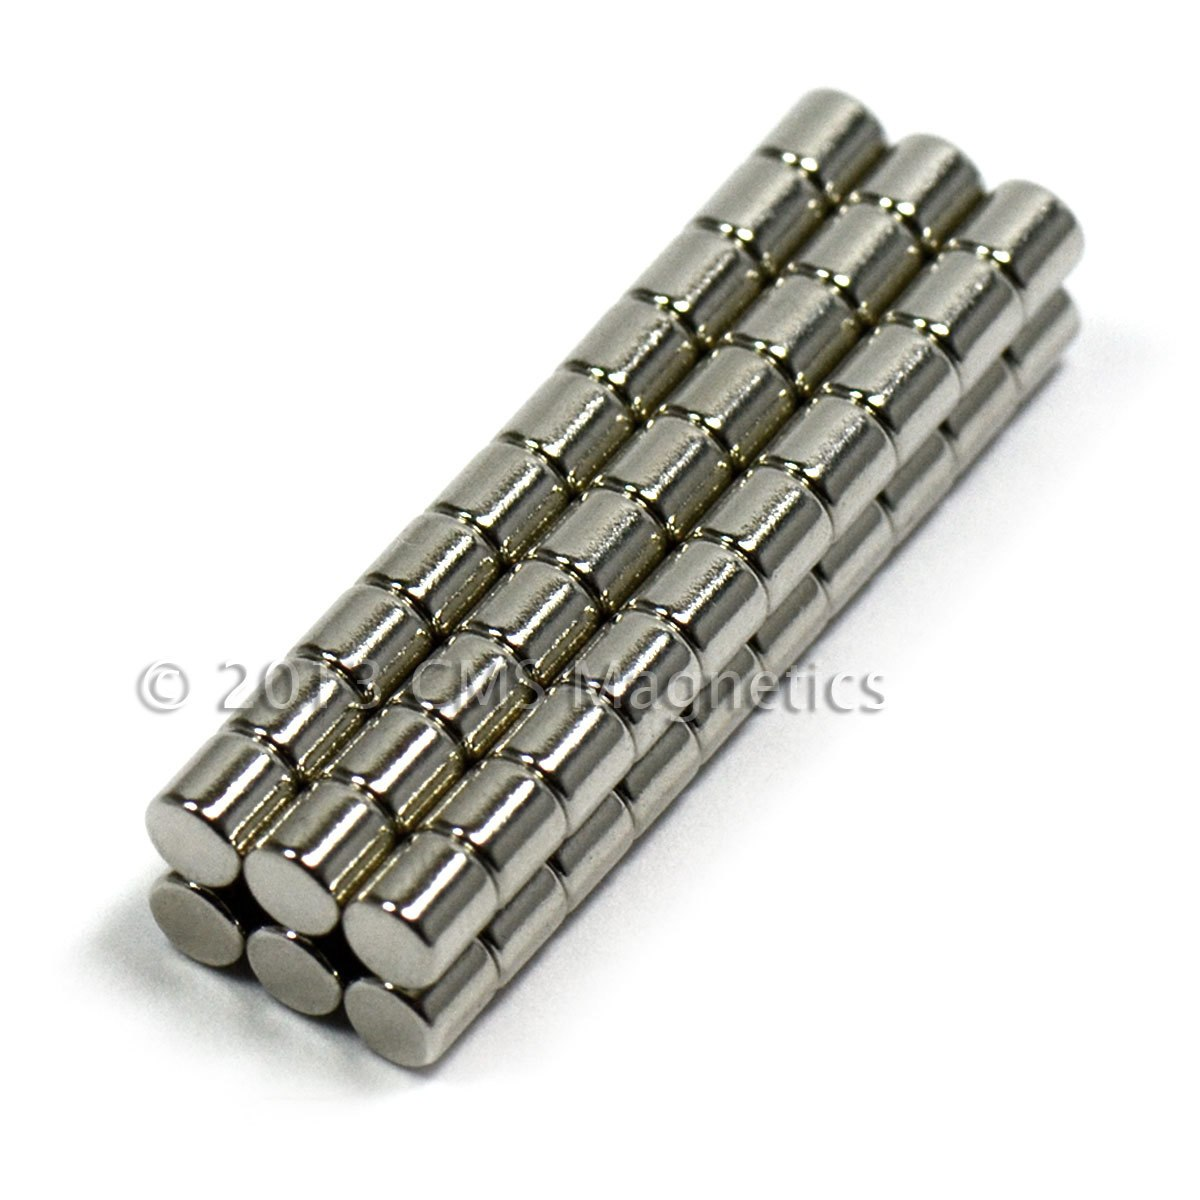 cylinder-magnet-n50-1-8-x1-8-neodymium.jpg